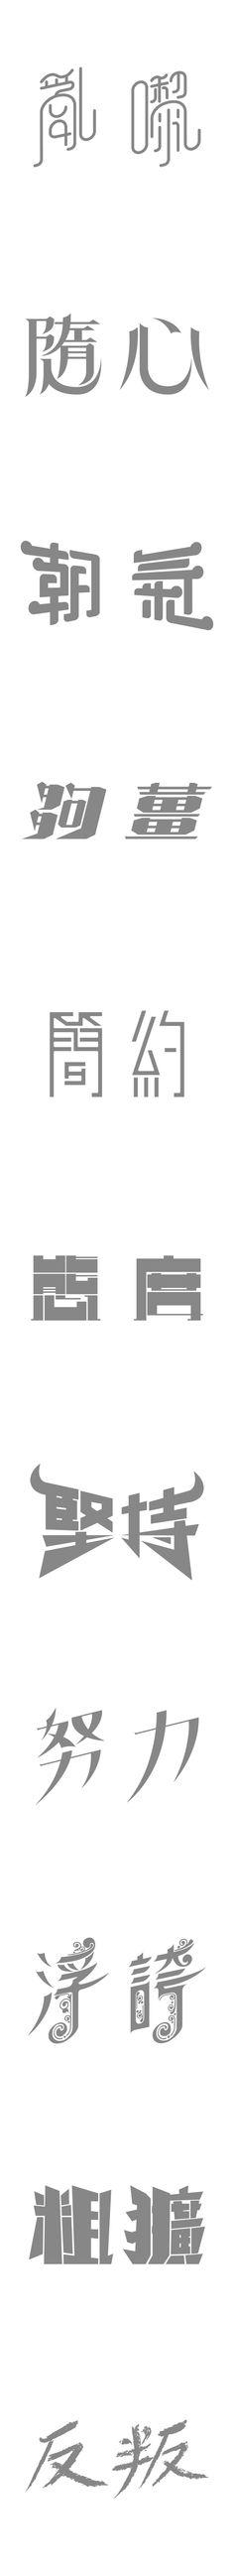 Chinese typographic designs